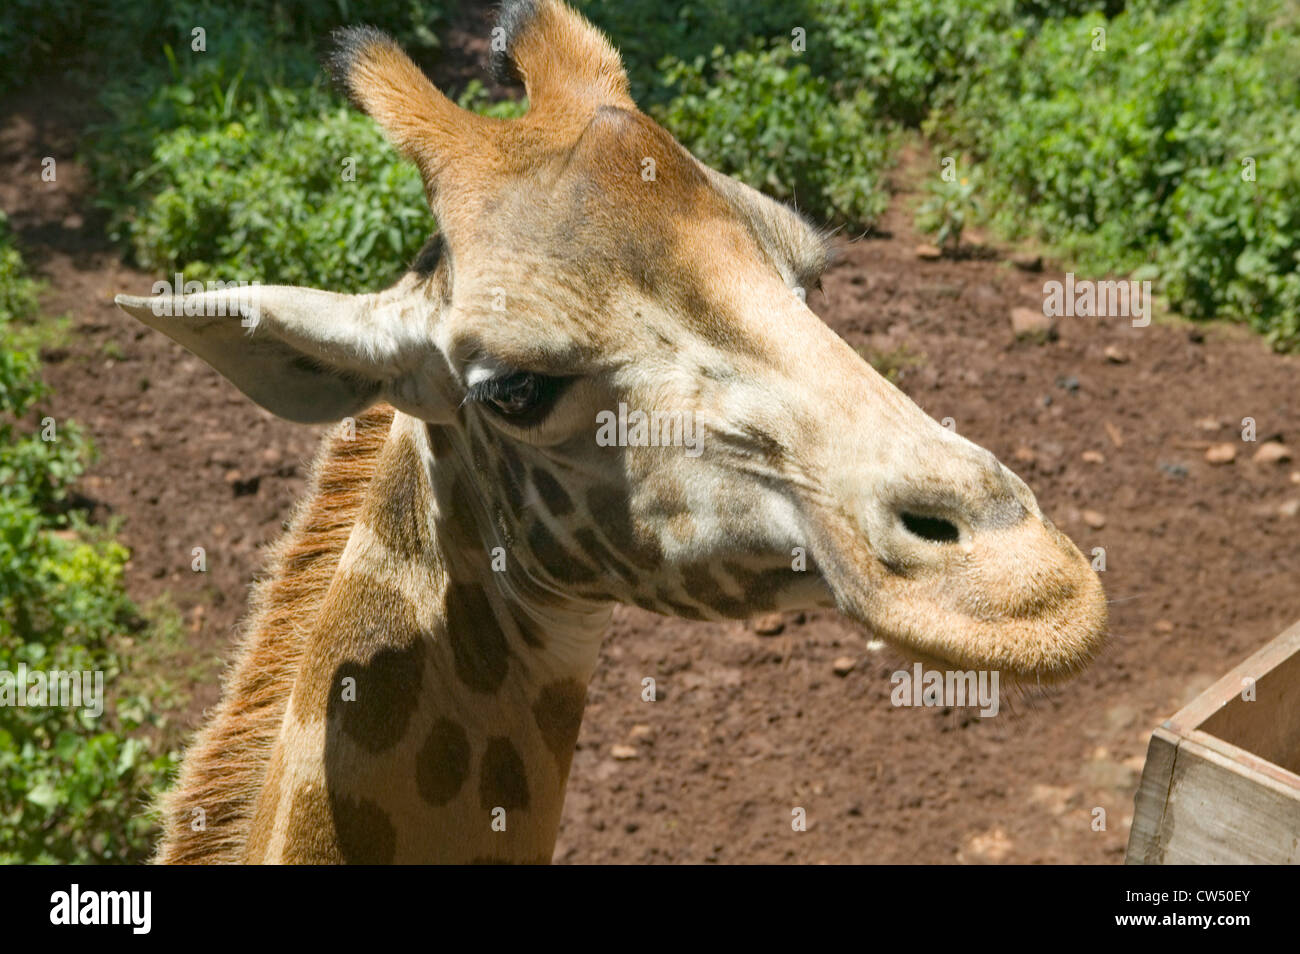 Close up Rothschild giraffe's head African Fund for Endangered Wildlife Giraffe Center near Nairobi National Park Nairobi Kenya Stock Photo